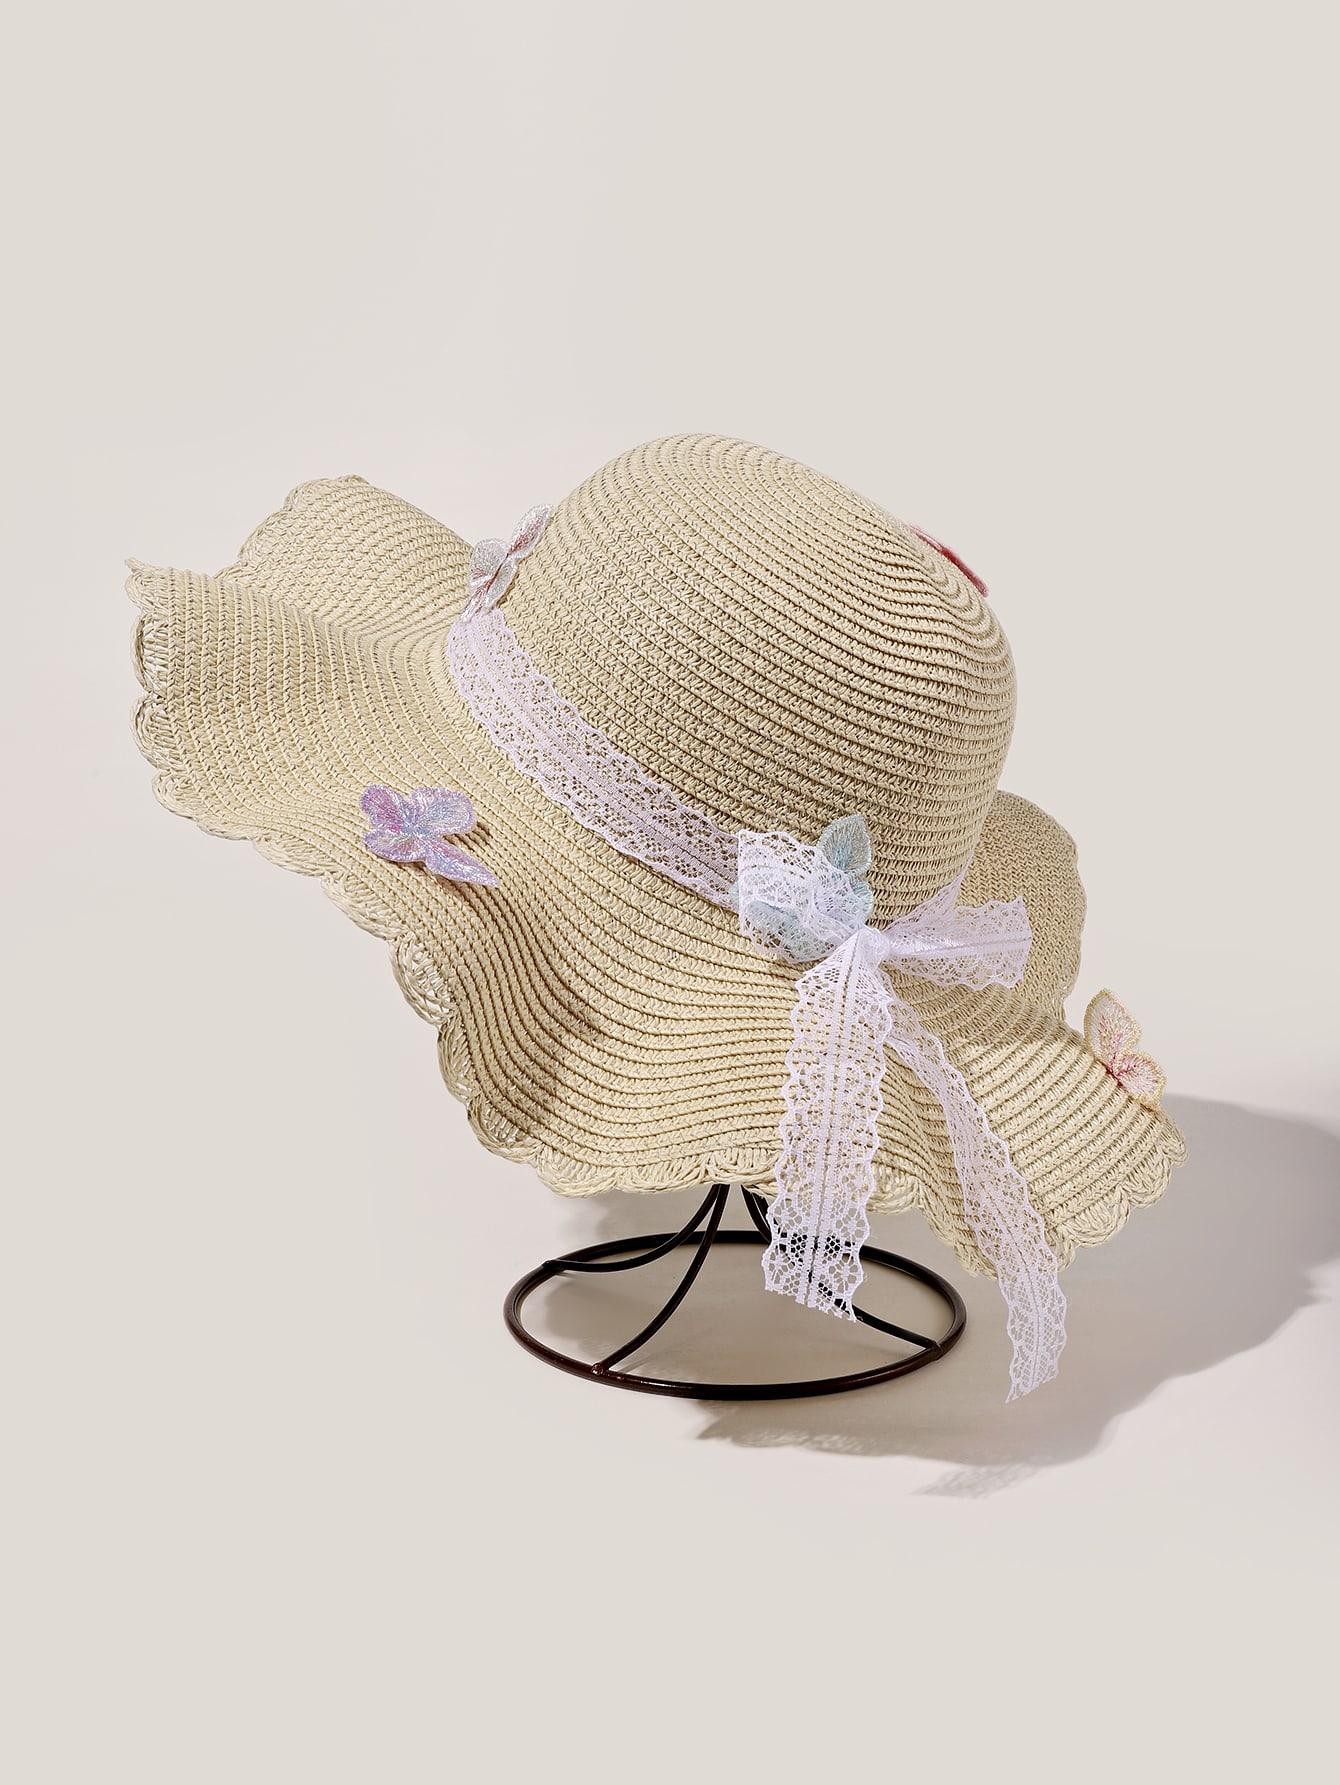 butterfly decor straw hat